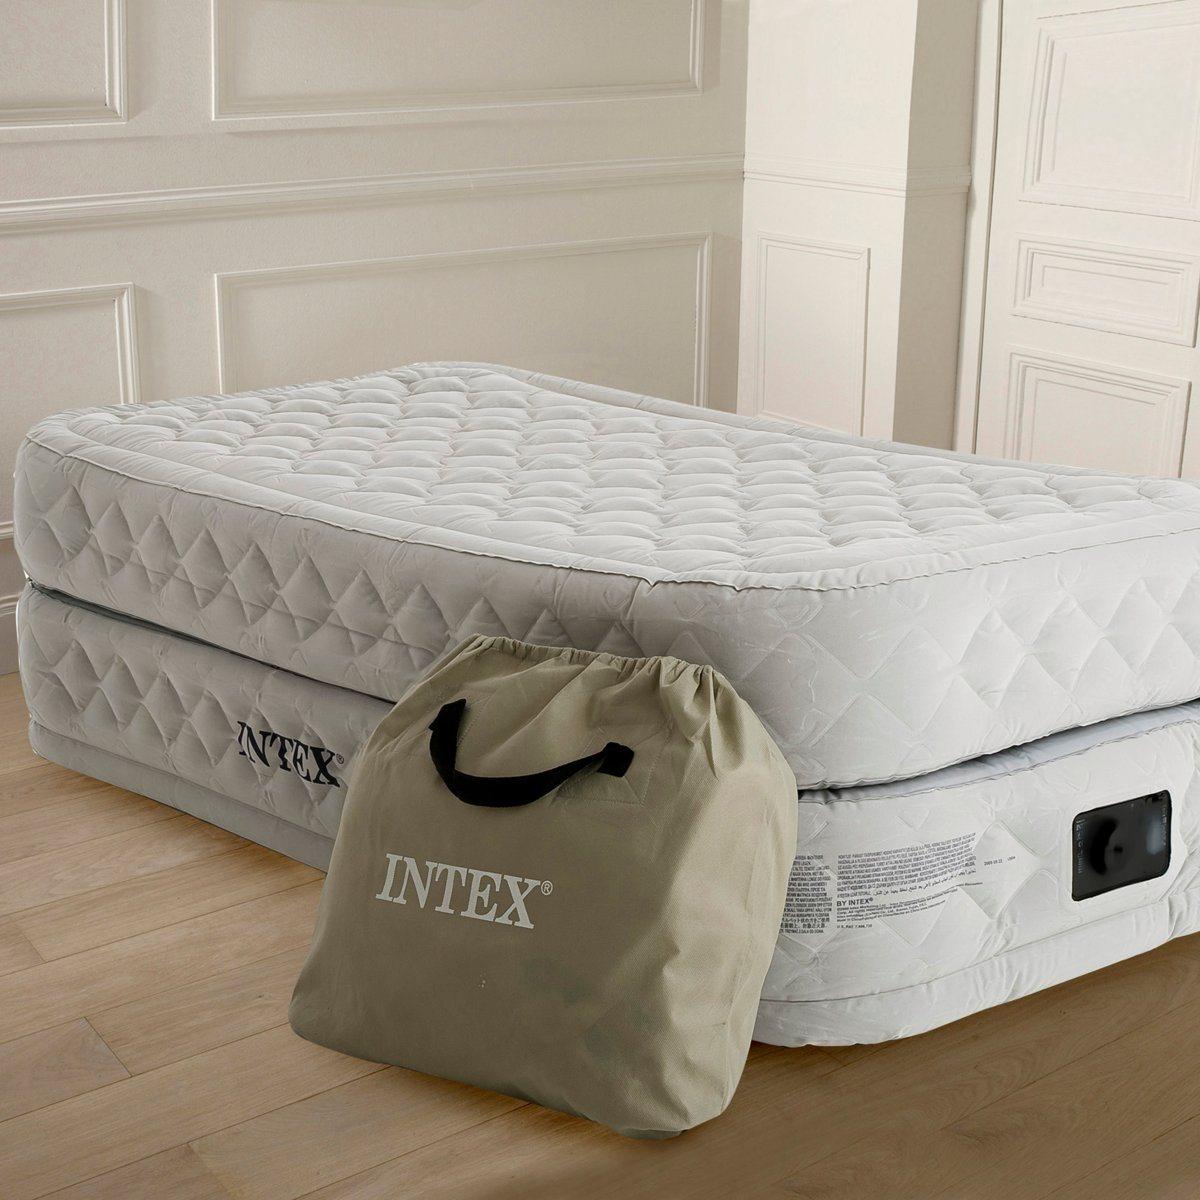 lit d appoint intex cuisine idconcept. Black Bedroom Furniture Sets. Home Design Ideas